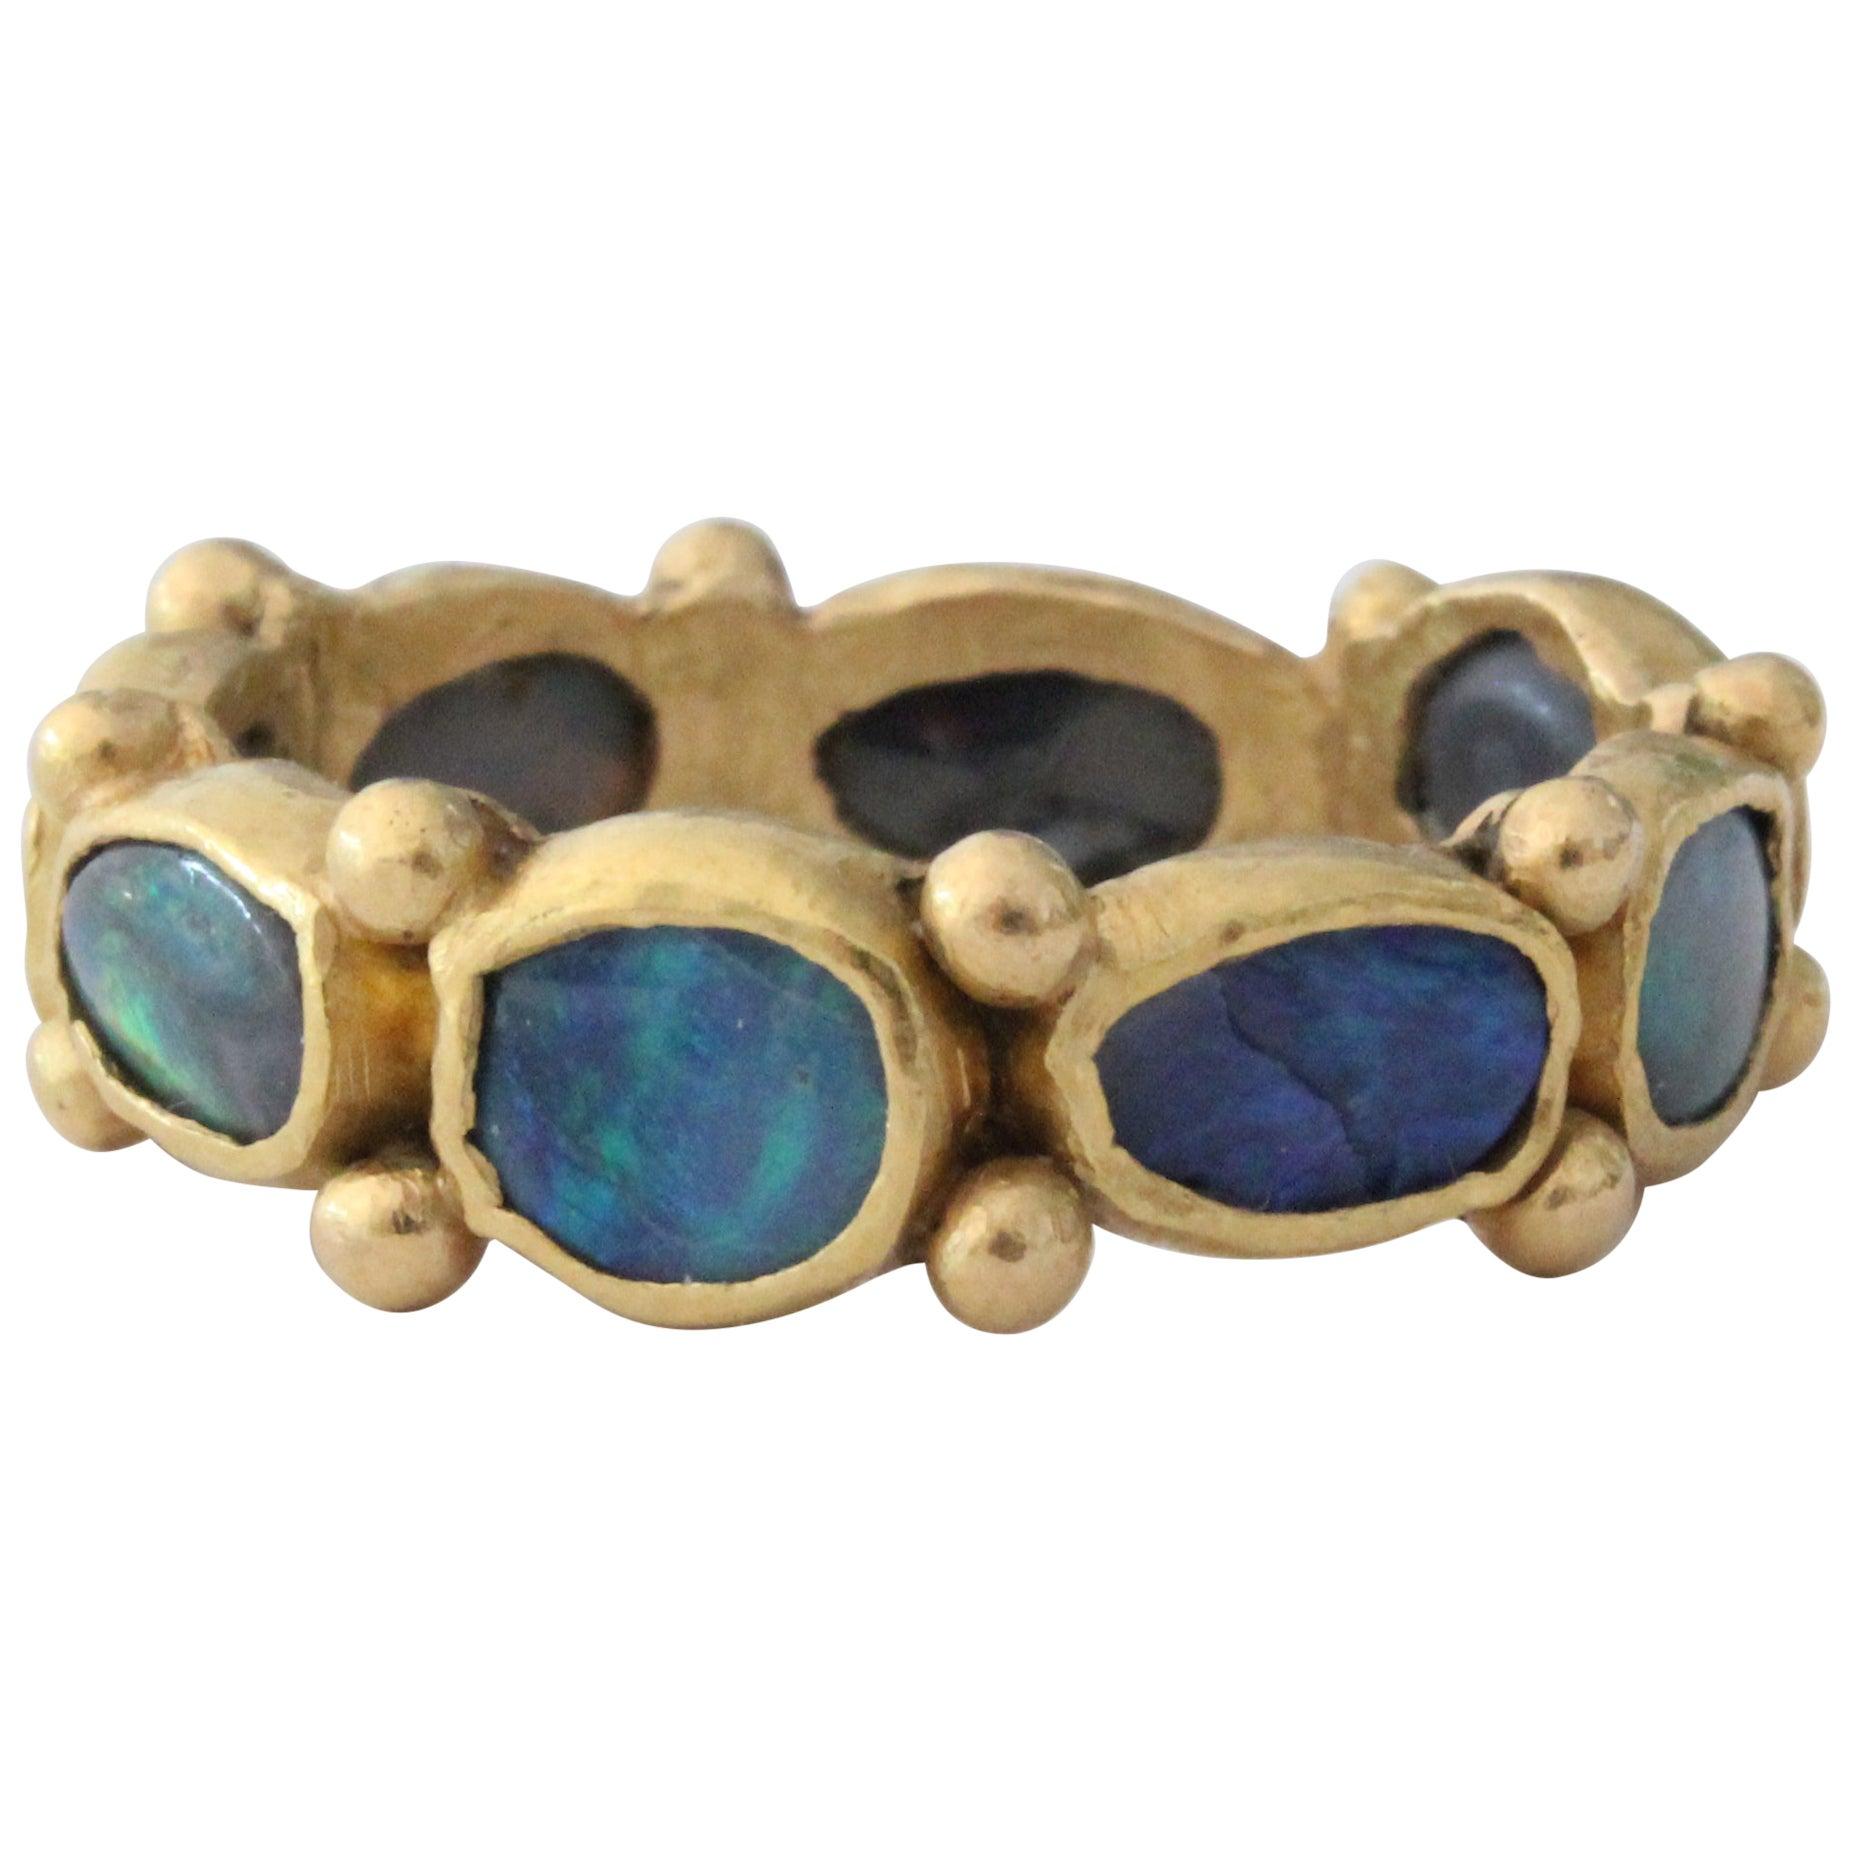 Black Opal 22 Karat Gold Bezel Band Fashion Ring One of a Kind Handmade Jewelry